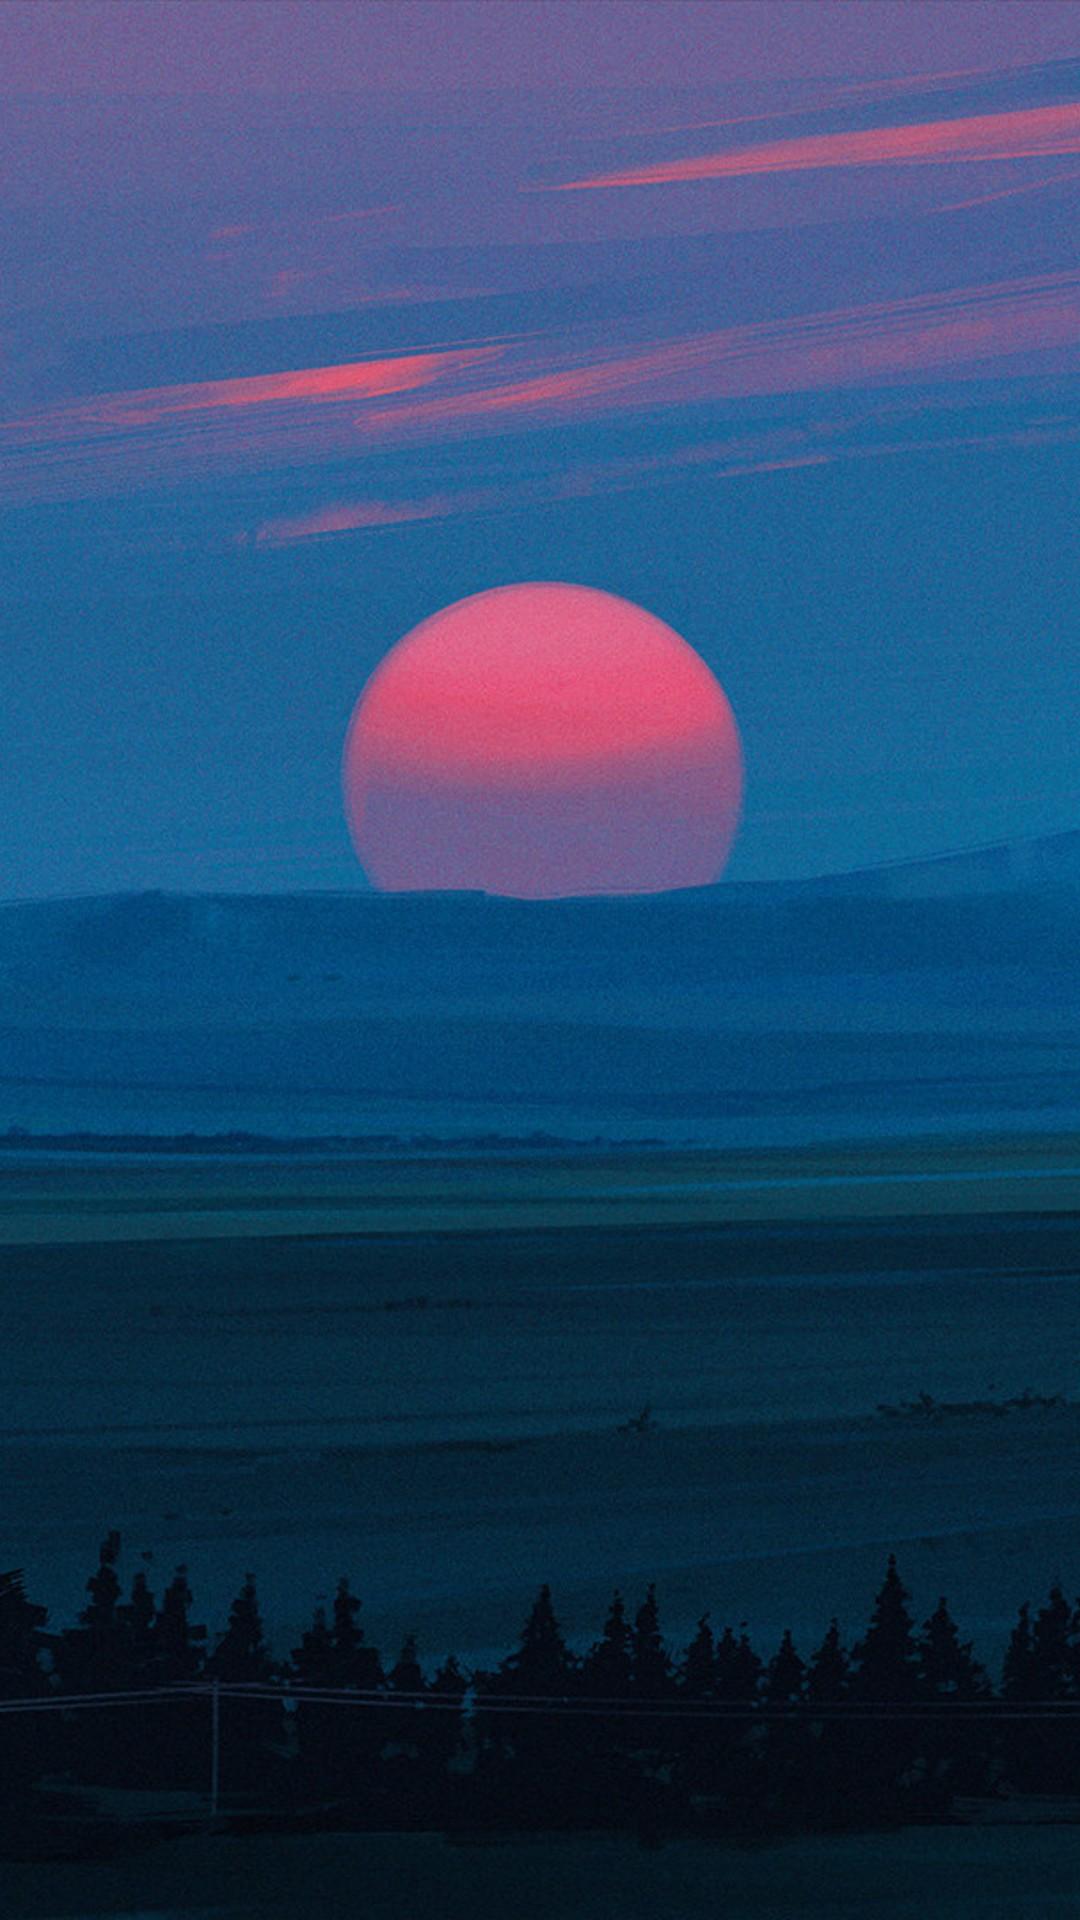 Cold Red Light Sunset Kg Wallpaper - [1080x1920]